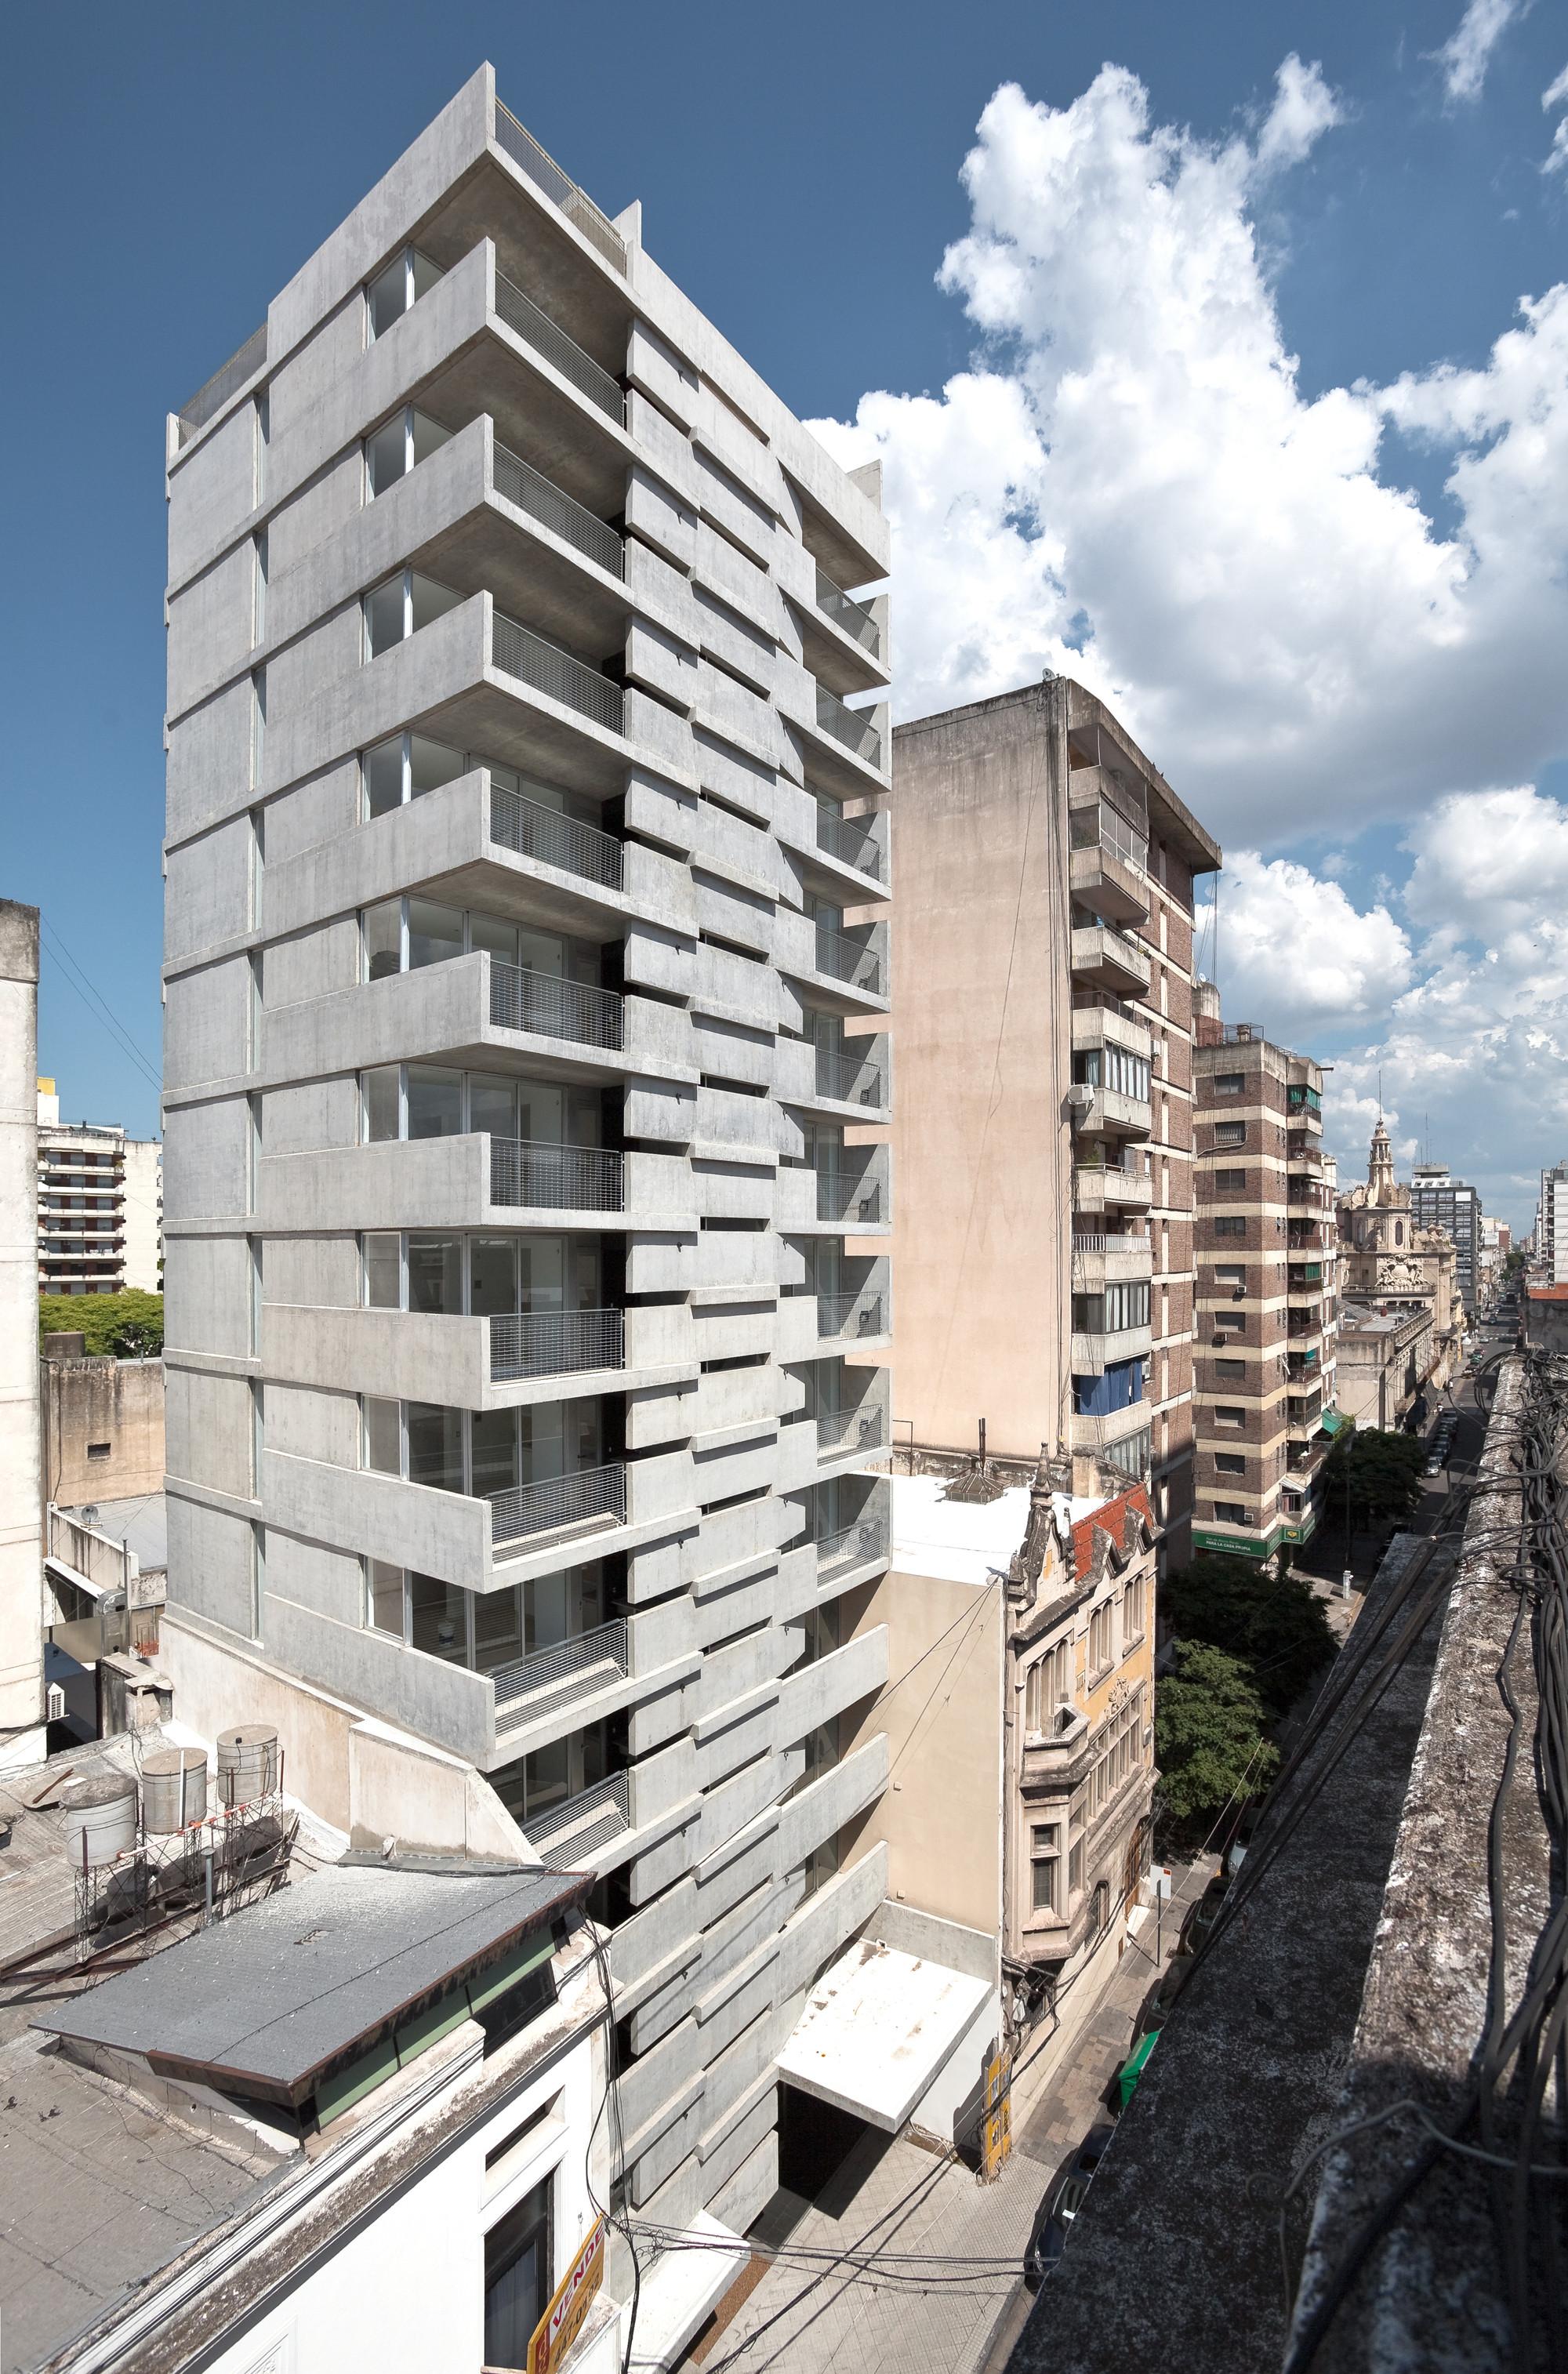 Maipu Building / Nicolás Campodonico, © Walter Salcedo